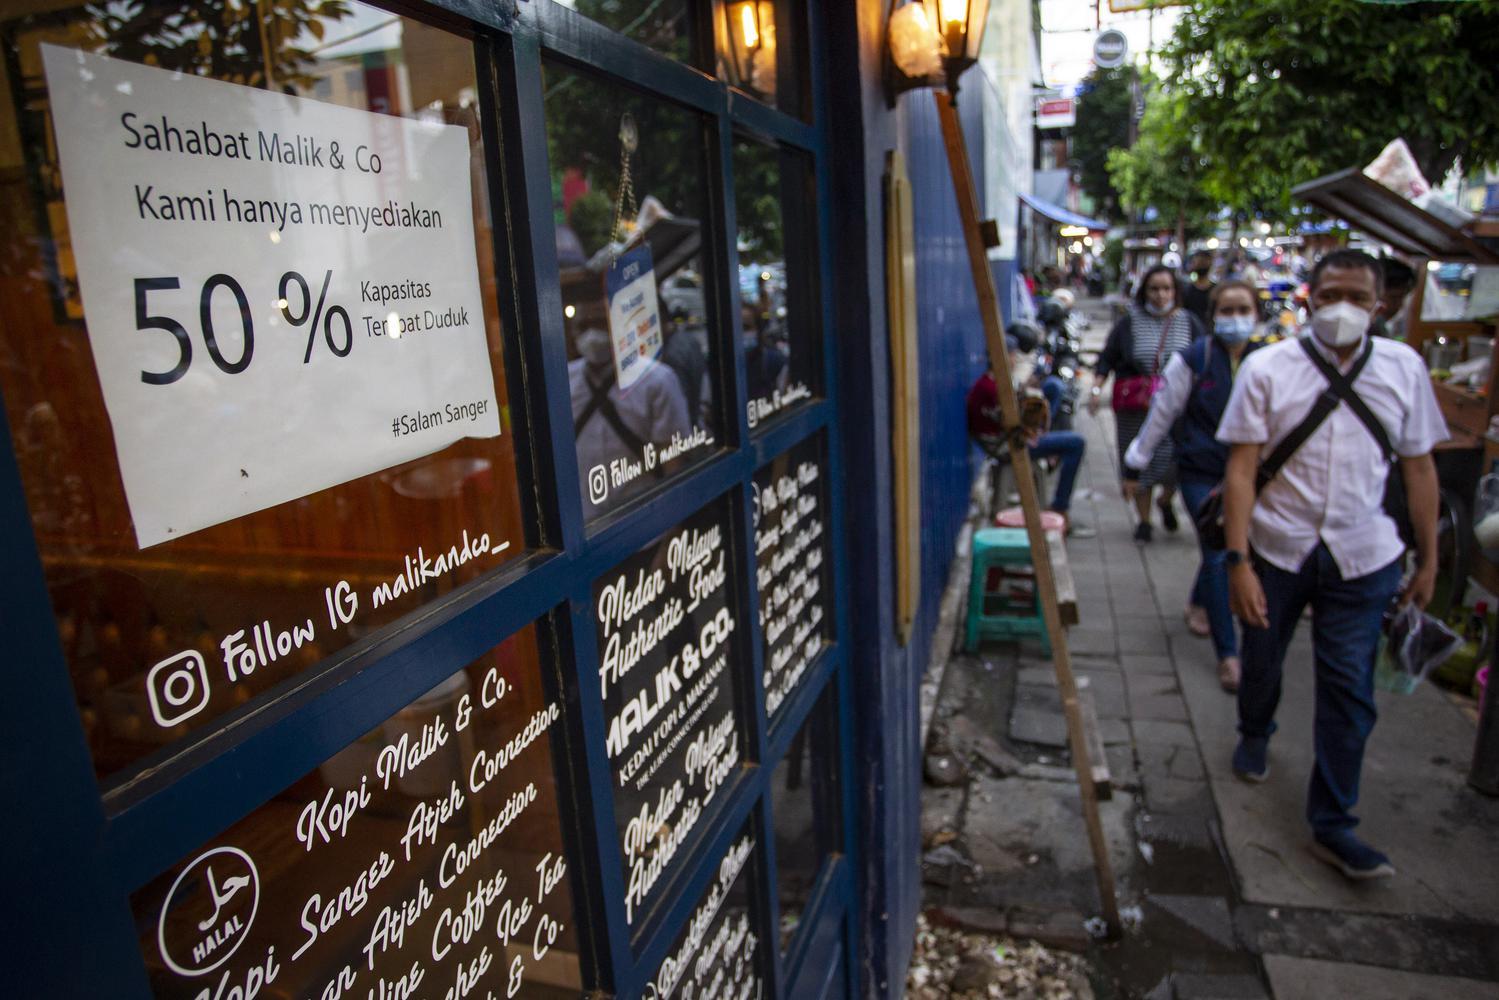 Warga berjalan di depan salah satu restoran di kawasan Sabang, Jakarta, Jumat (8/1/2021). Pemerintah menetapkan kebijakan Pemberlakuan Pembatasan Kegiatan Masyarakat (PPKM) di wilayah Jawa-Bali pada 11-25 Januari mendatang guna menekan angka penularan COVID-19 yang salah satunya membatasi kegiatan di restoran untuk makan atau minum di tempat hanya diperbolehkan sebanyak 25 persen dari kapasitas.